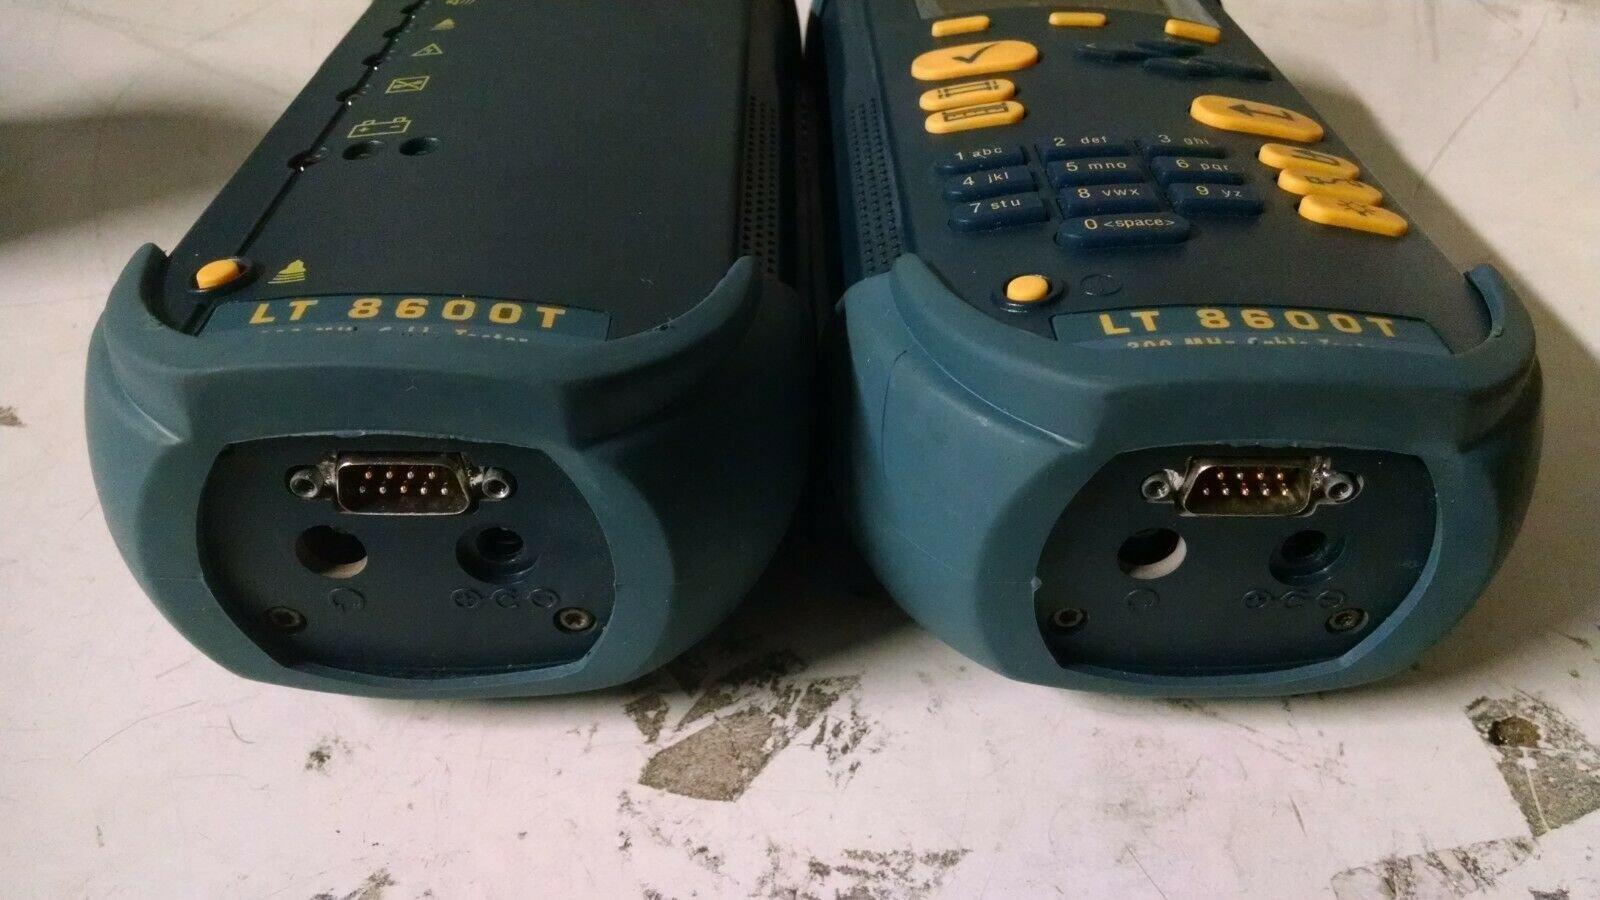 Wavetek-LT8600